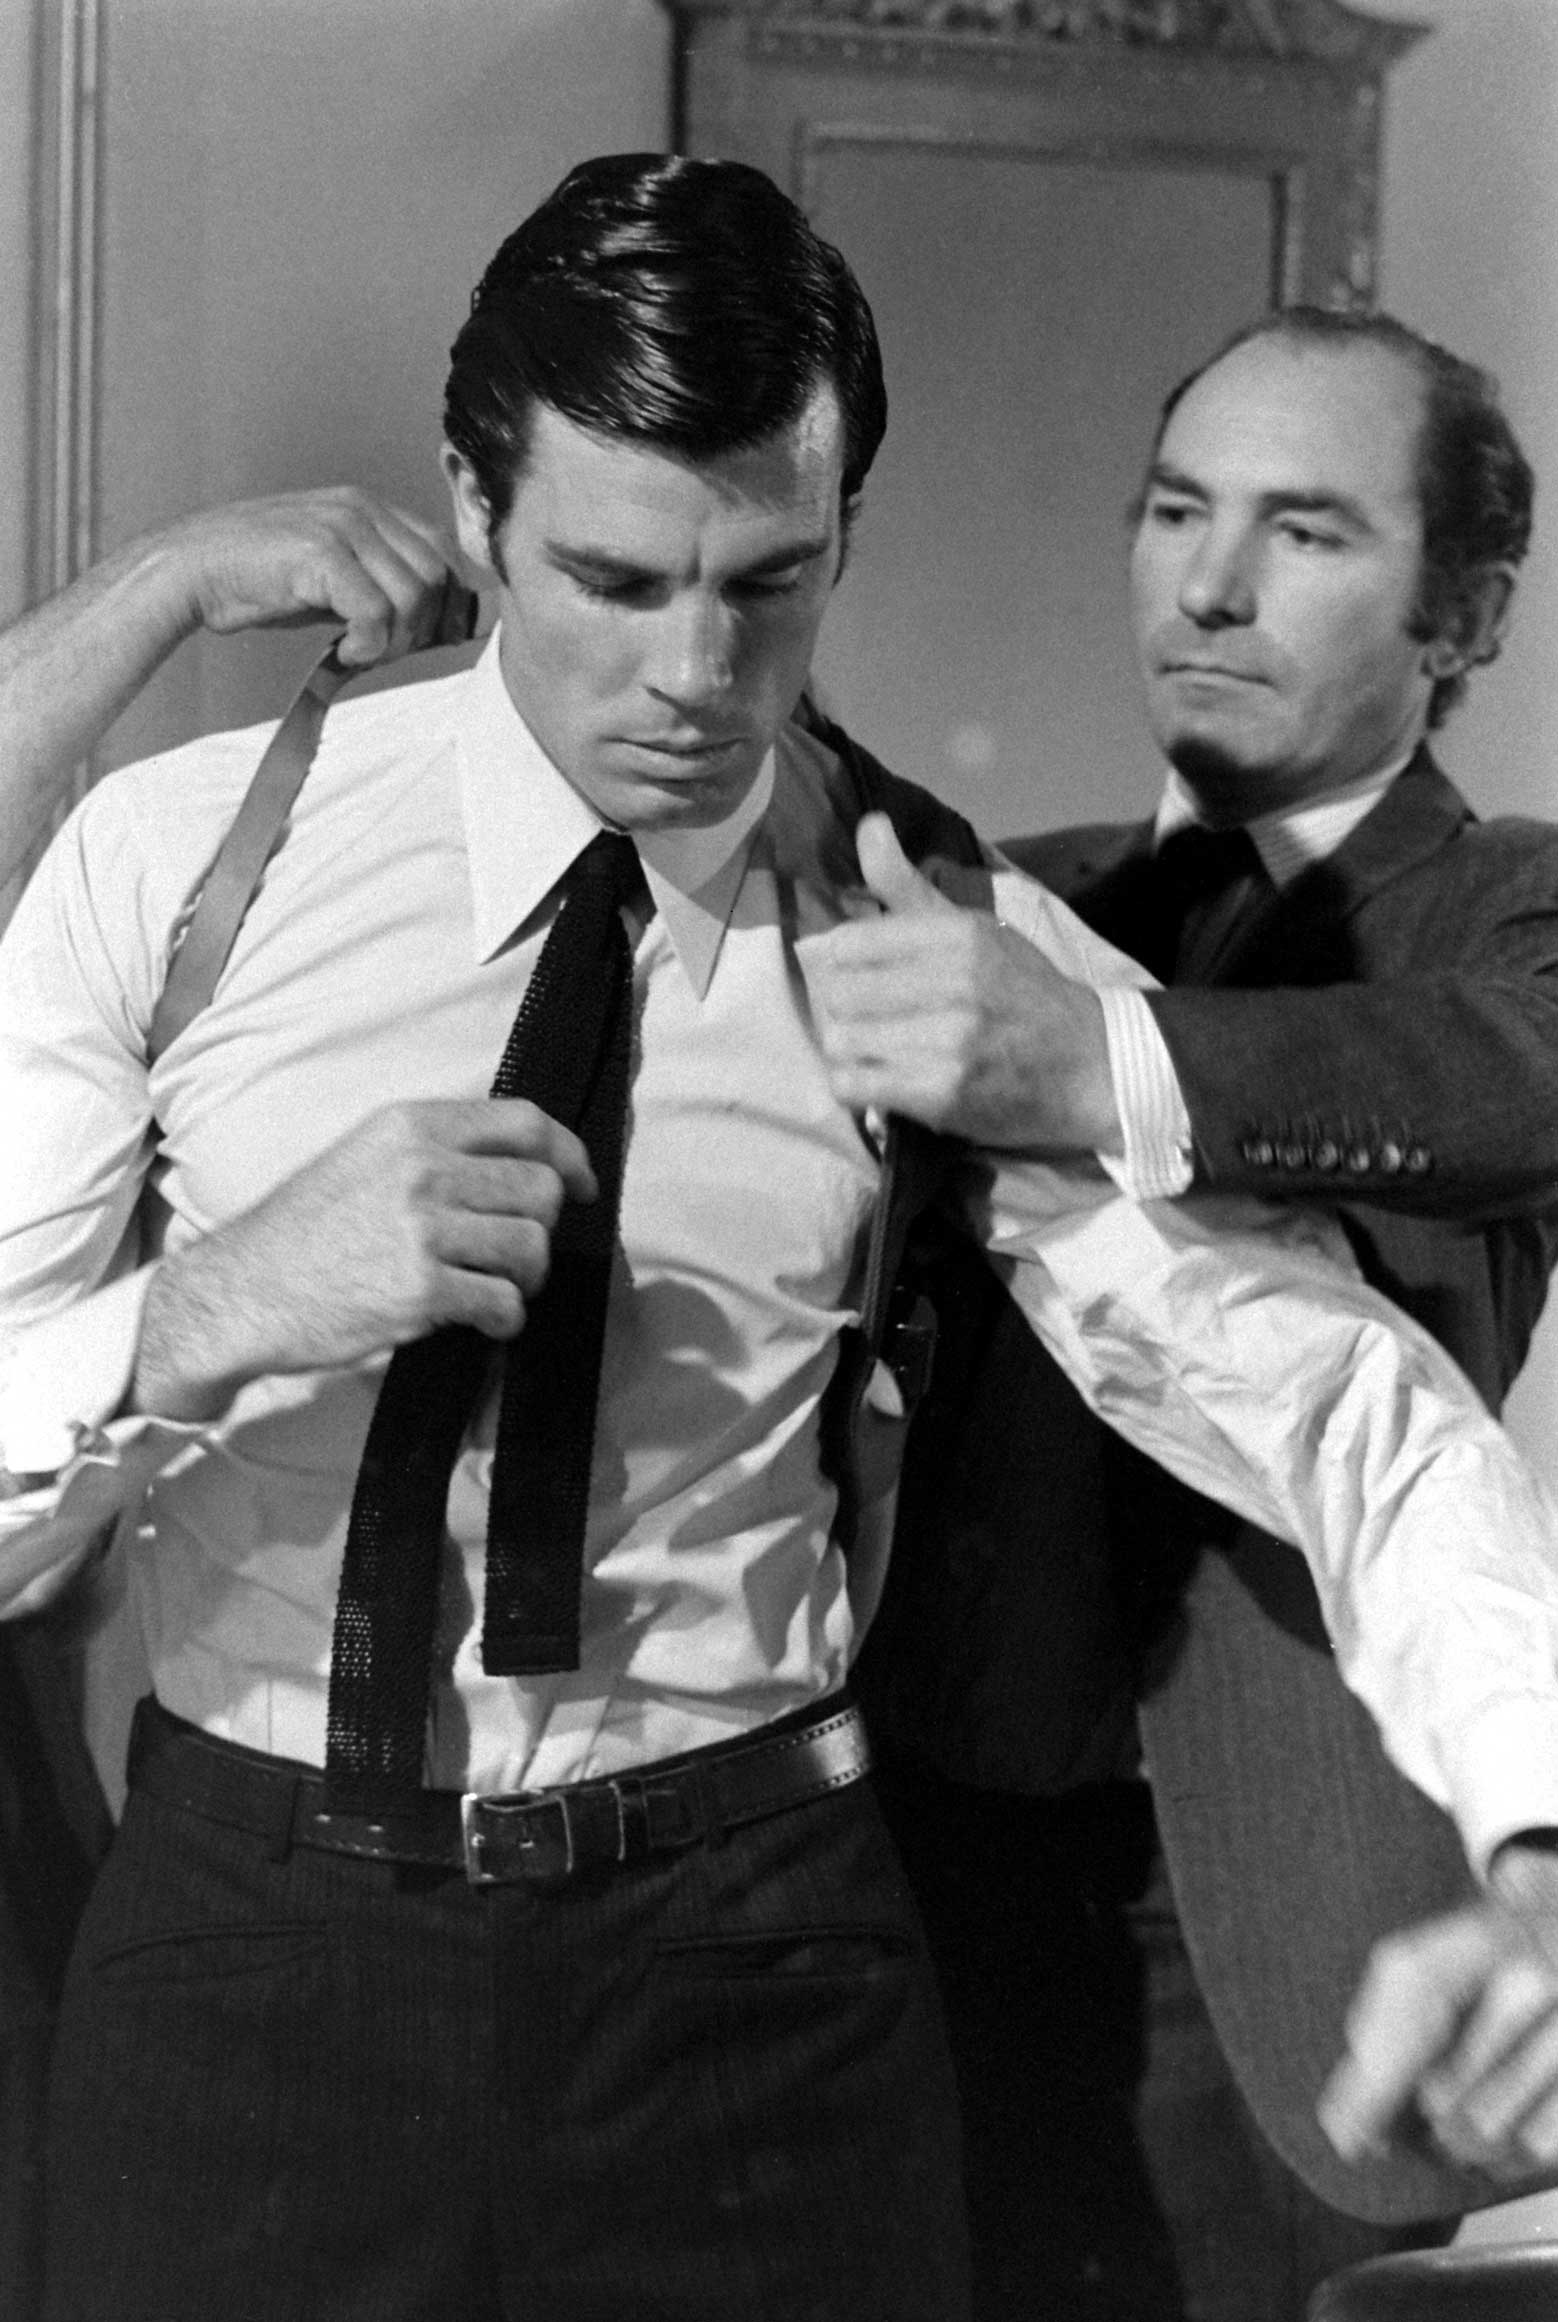 Director Peter R. Hunt helps Robert Campbell get into a shoulder holster, 1967.